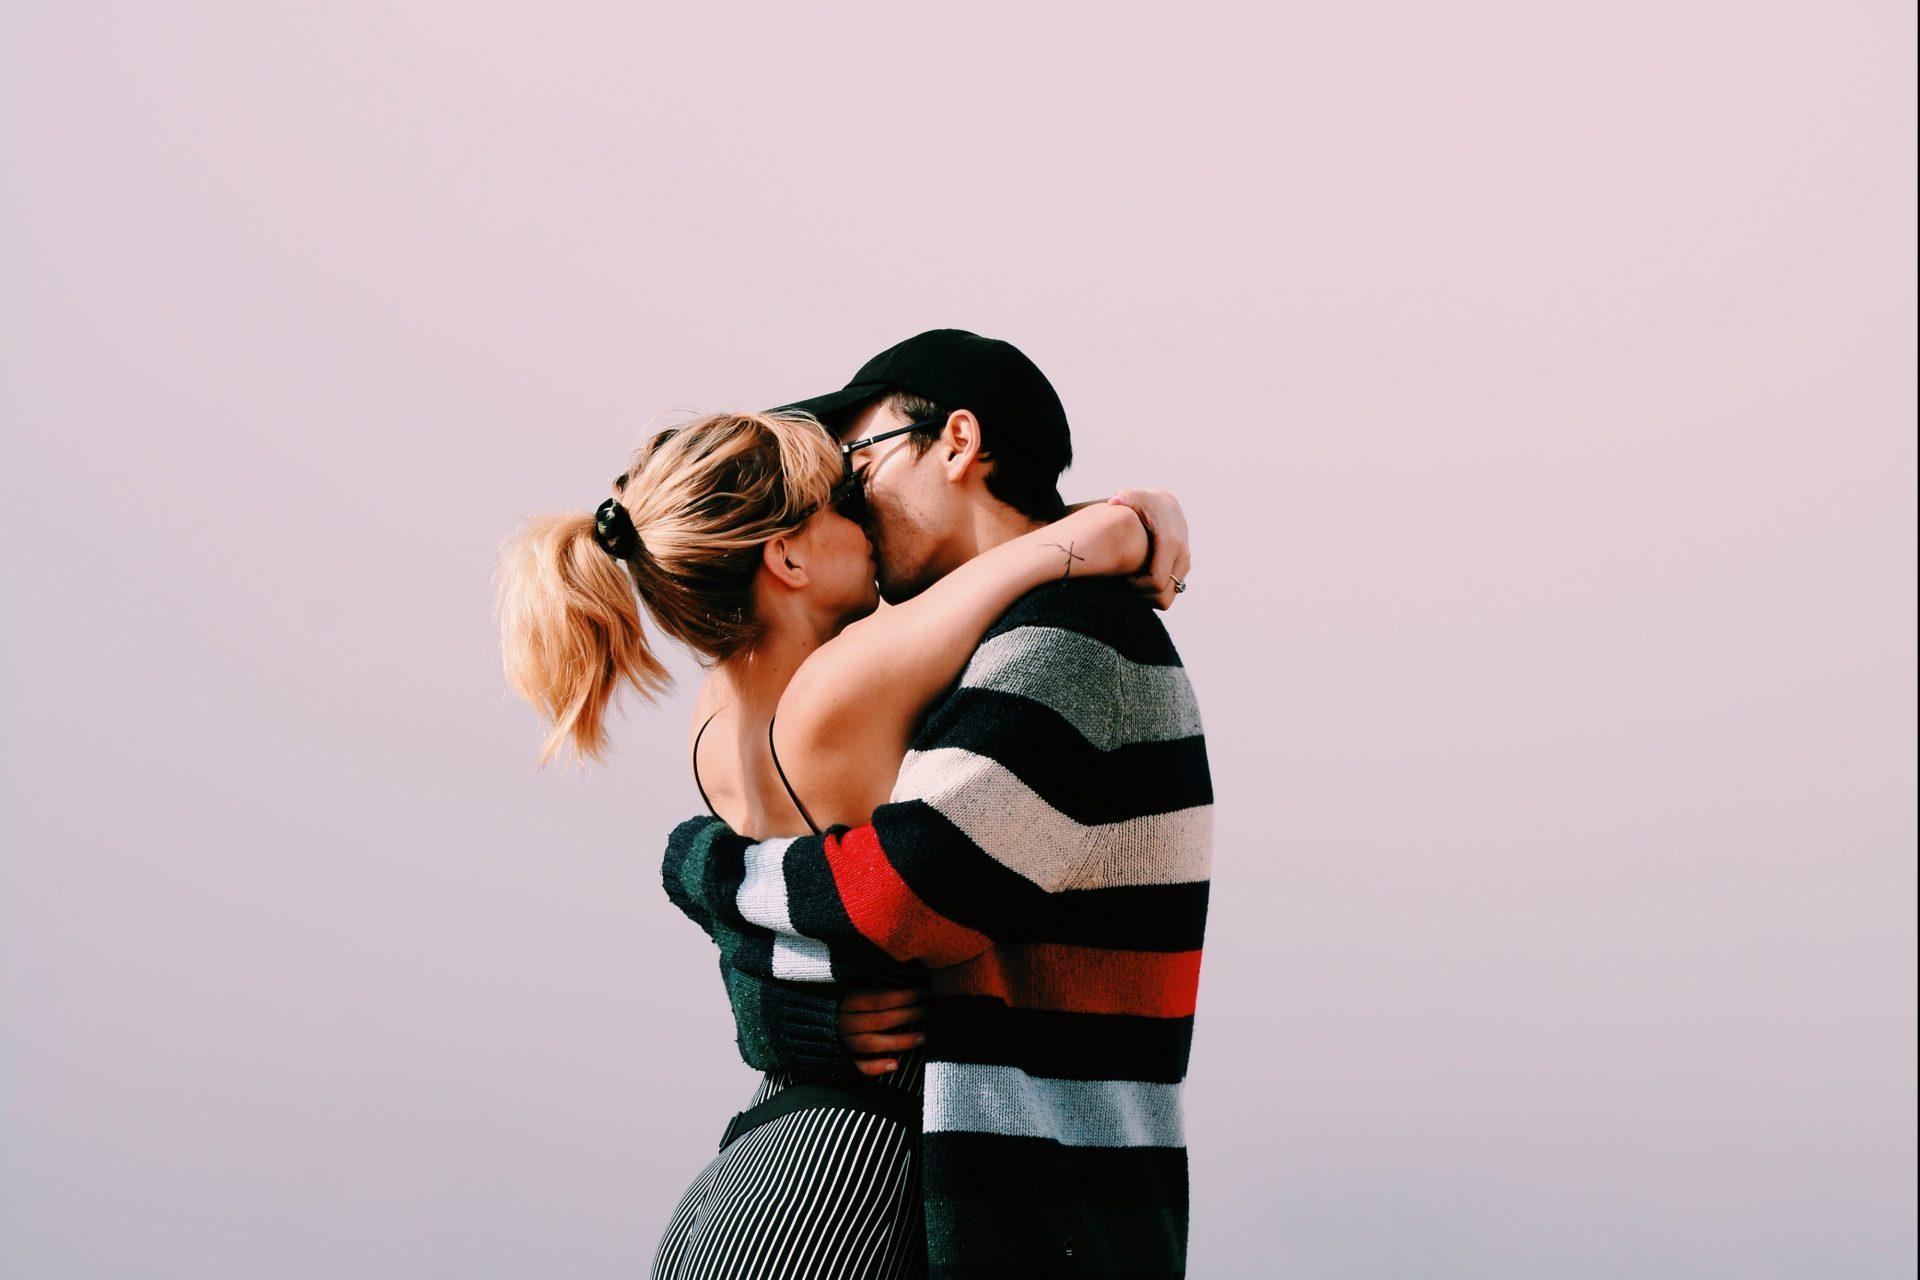 Don't Settle For An Unbalanced, Unreliable, Untrustworthy Relationship